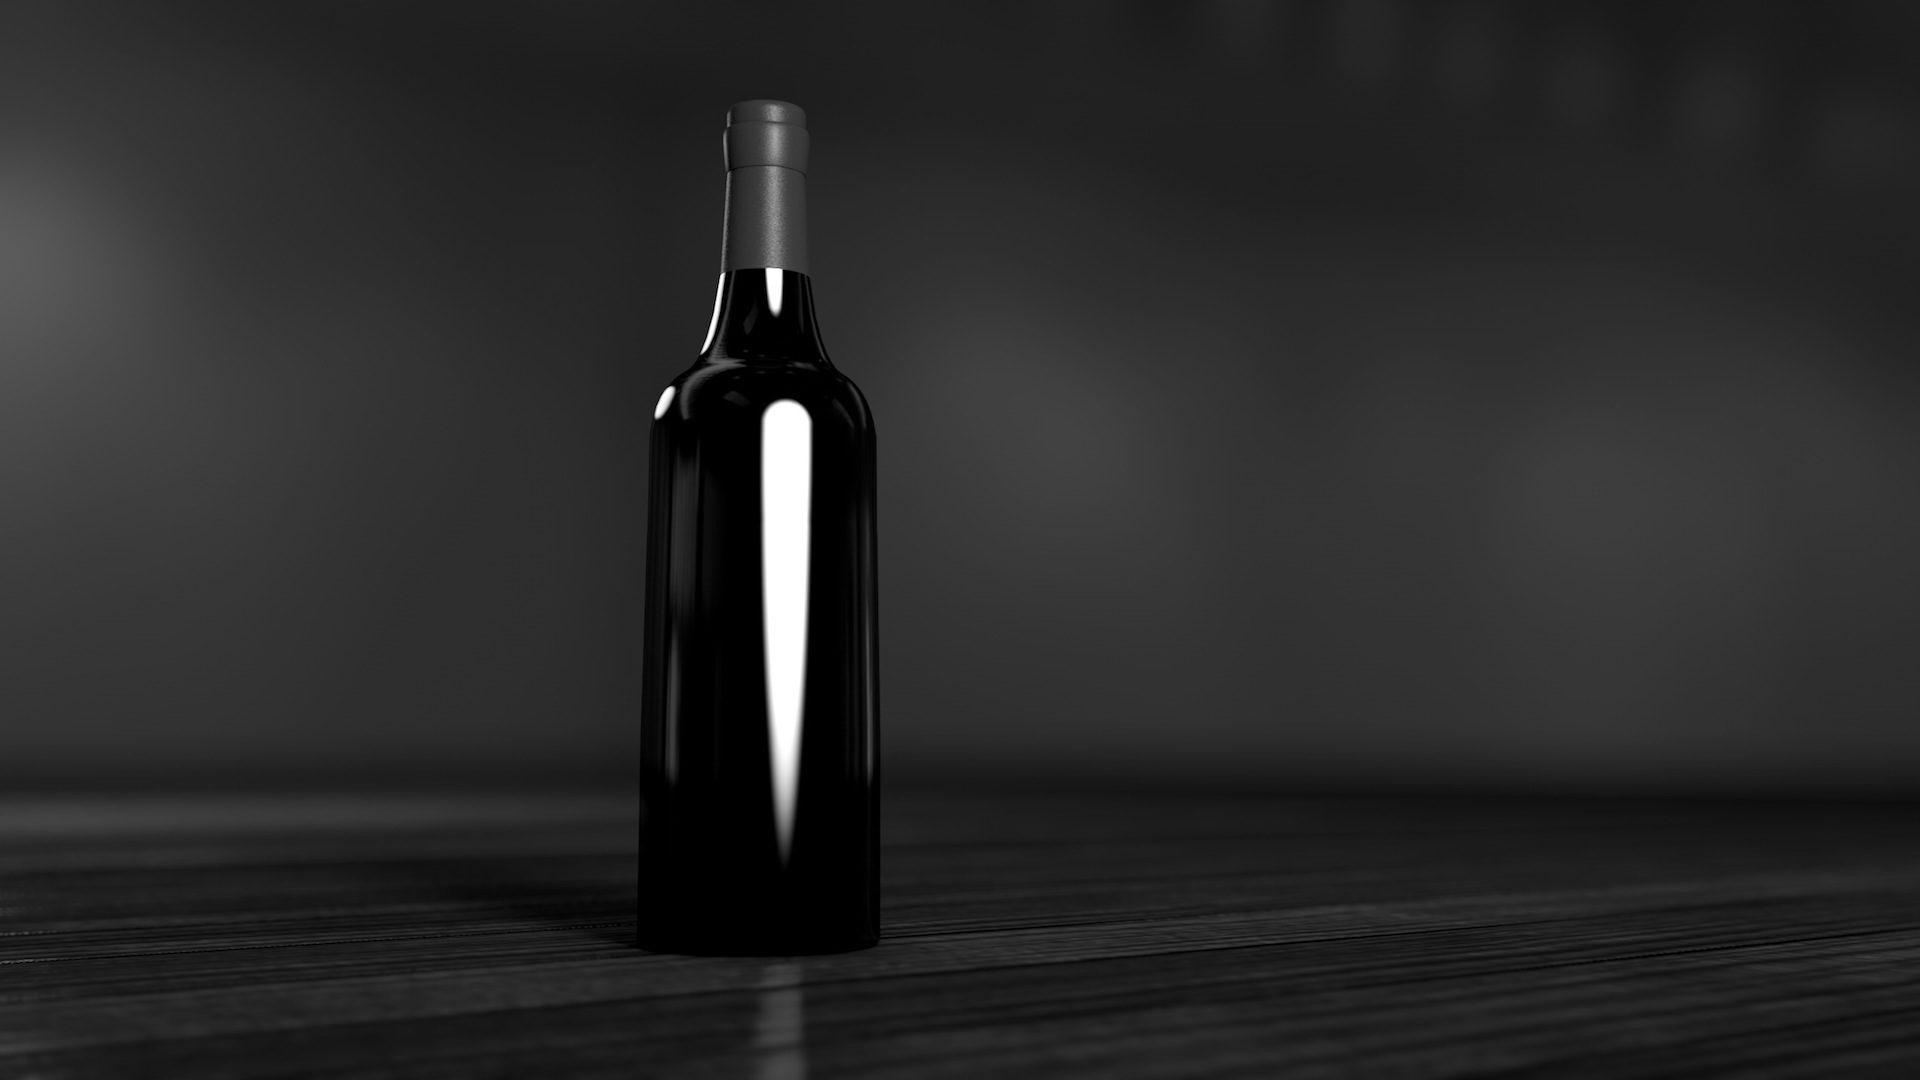 bottiglia, vino, minimalista, Soledad, in bianco e nero - Sfondi HD - Professor-falken.com